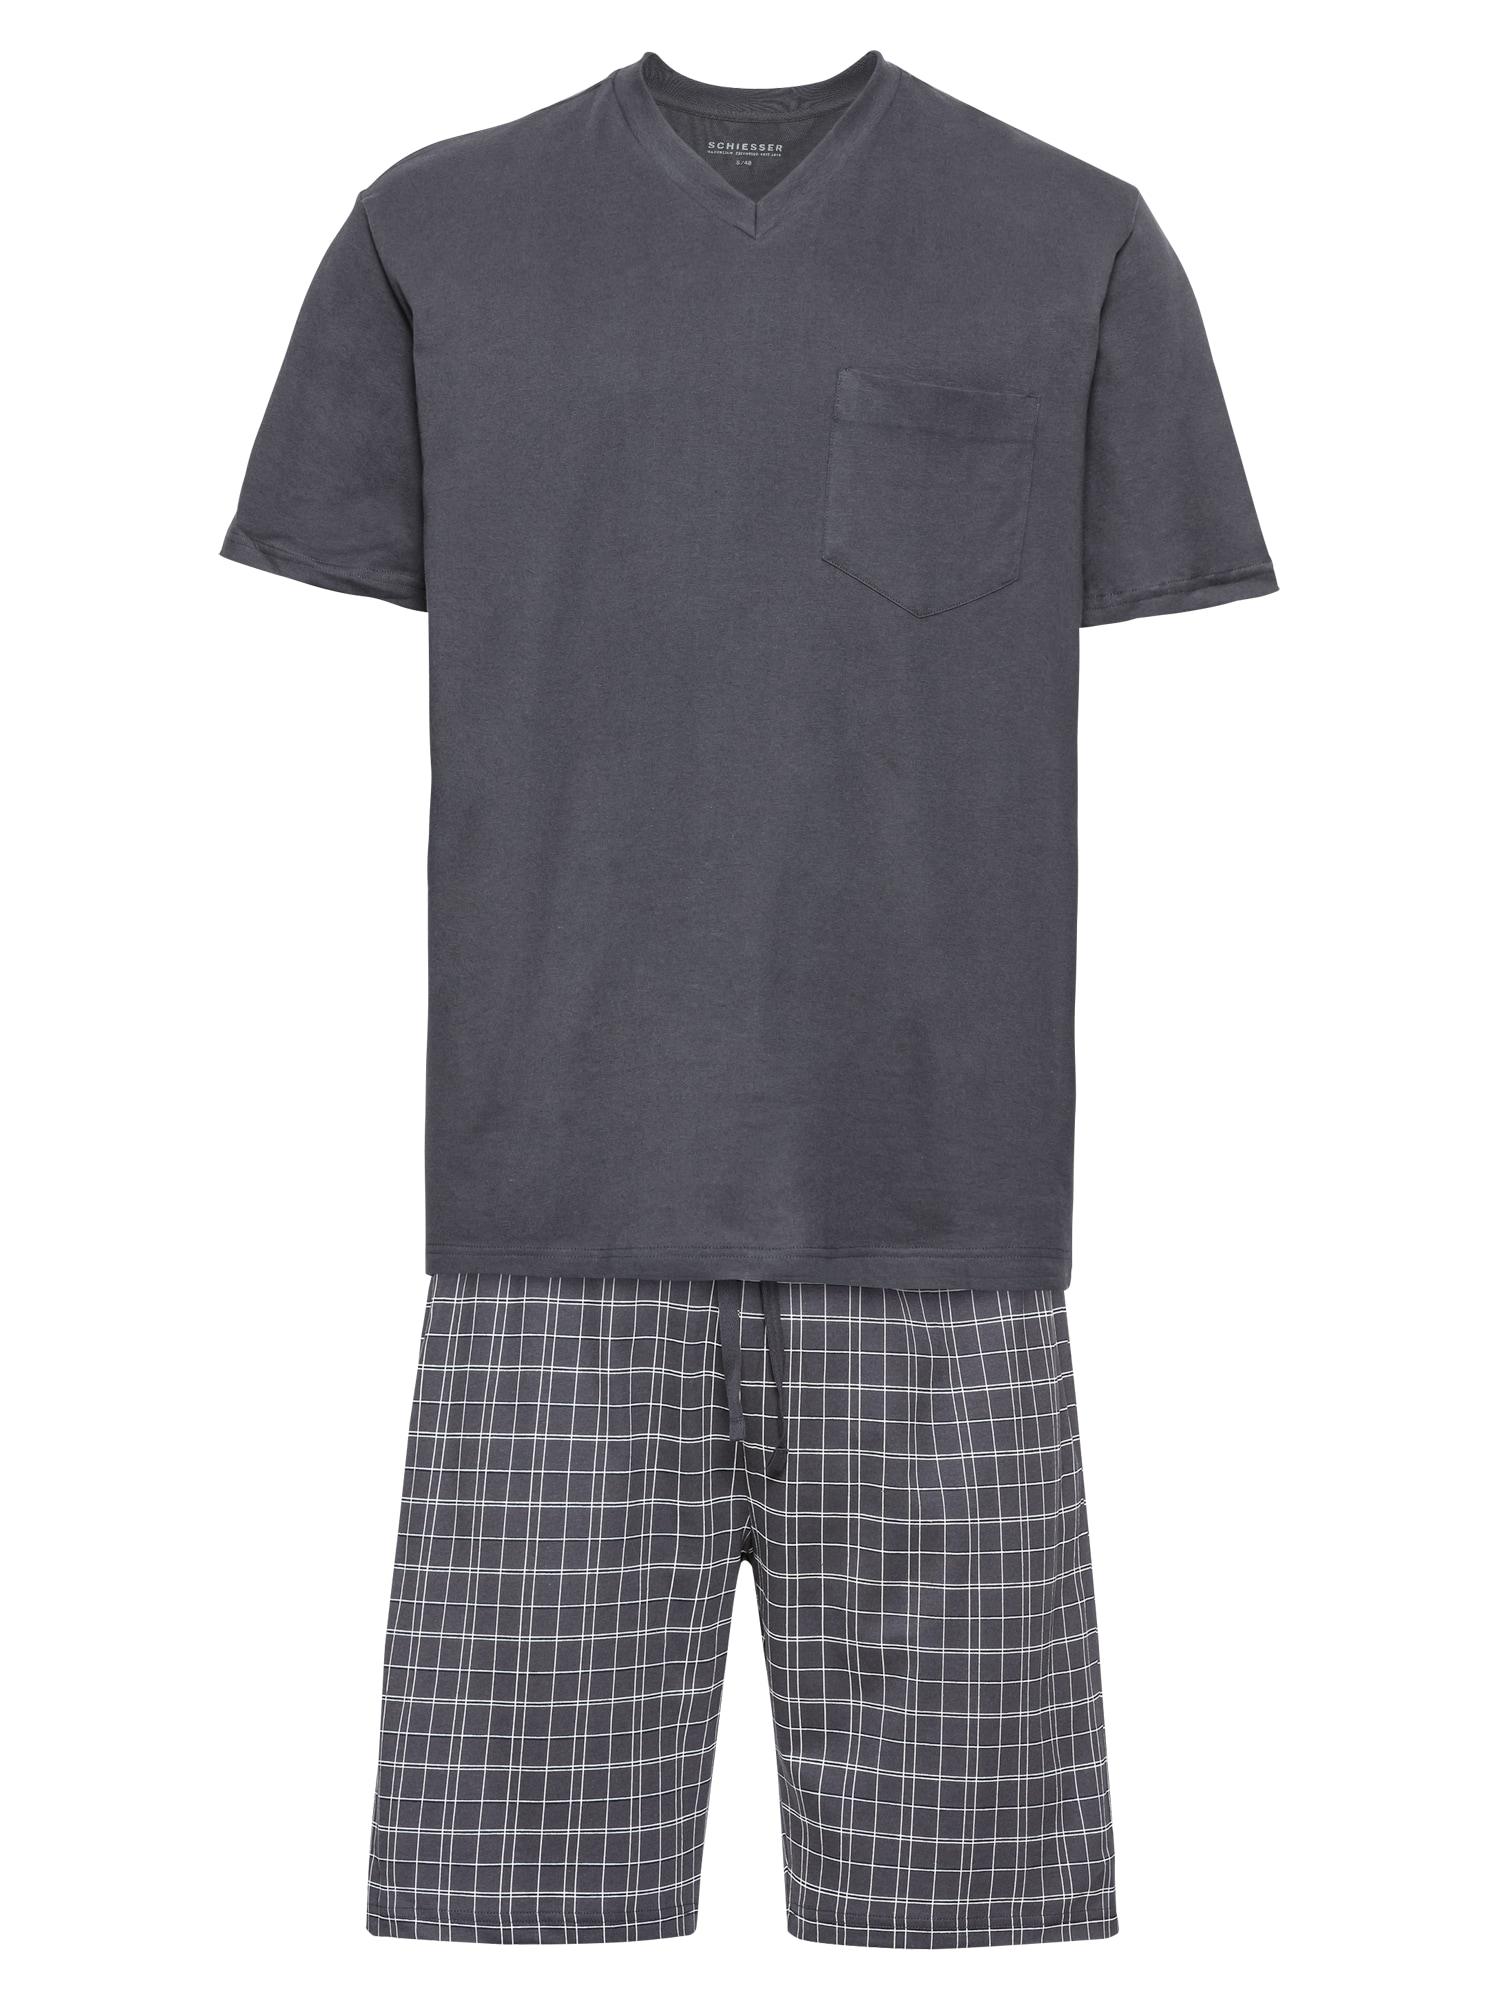 Pyžamové kalhoty Anzug Kurz antracitová SCHIESSER